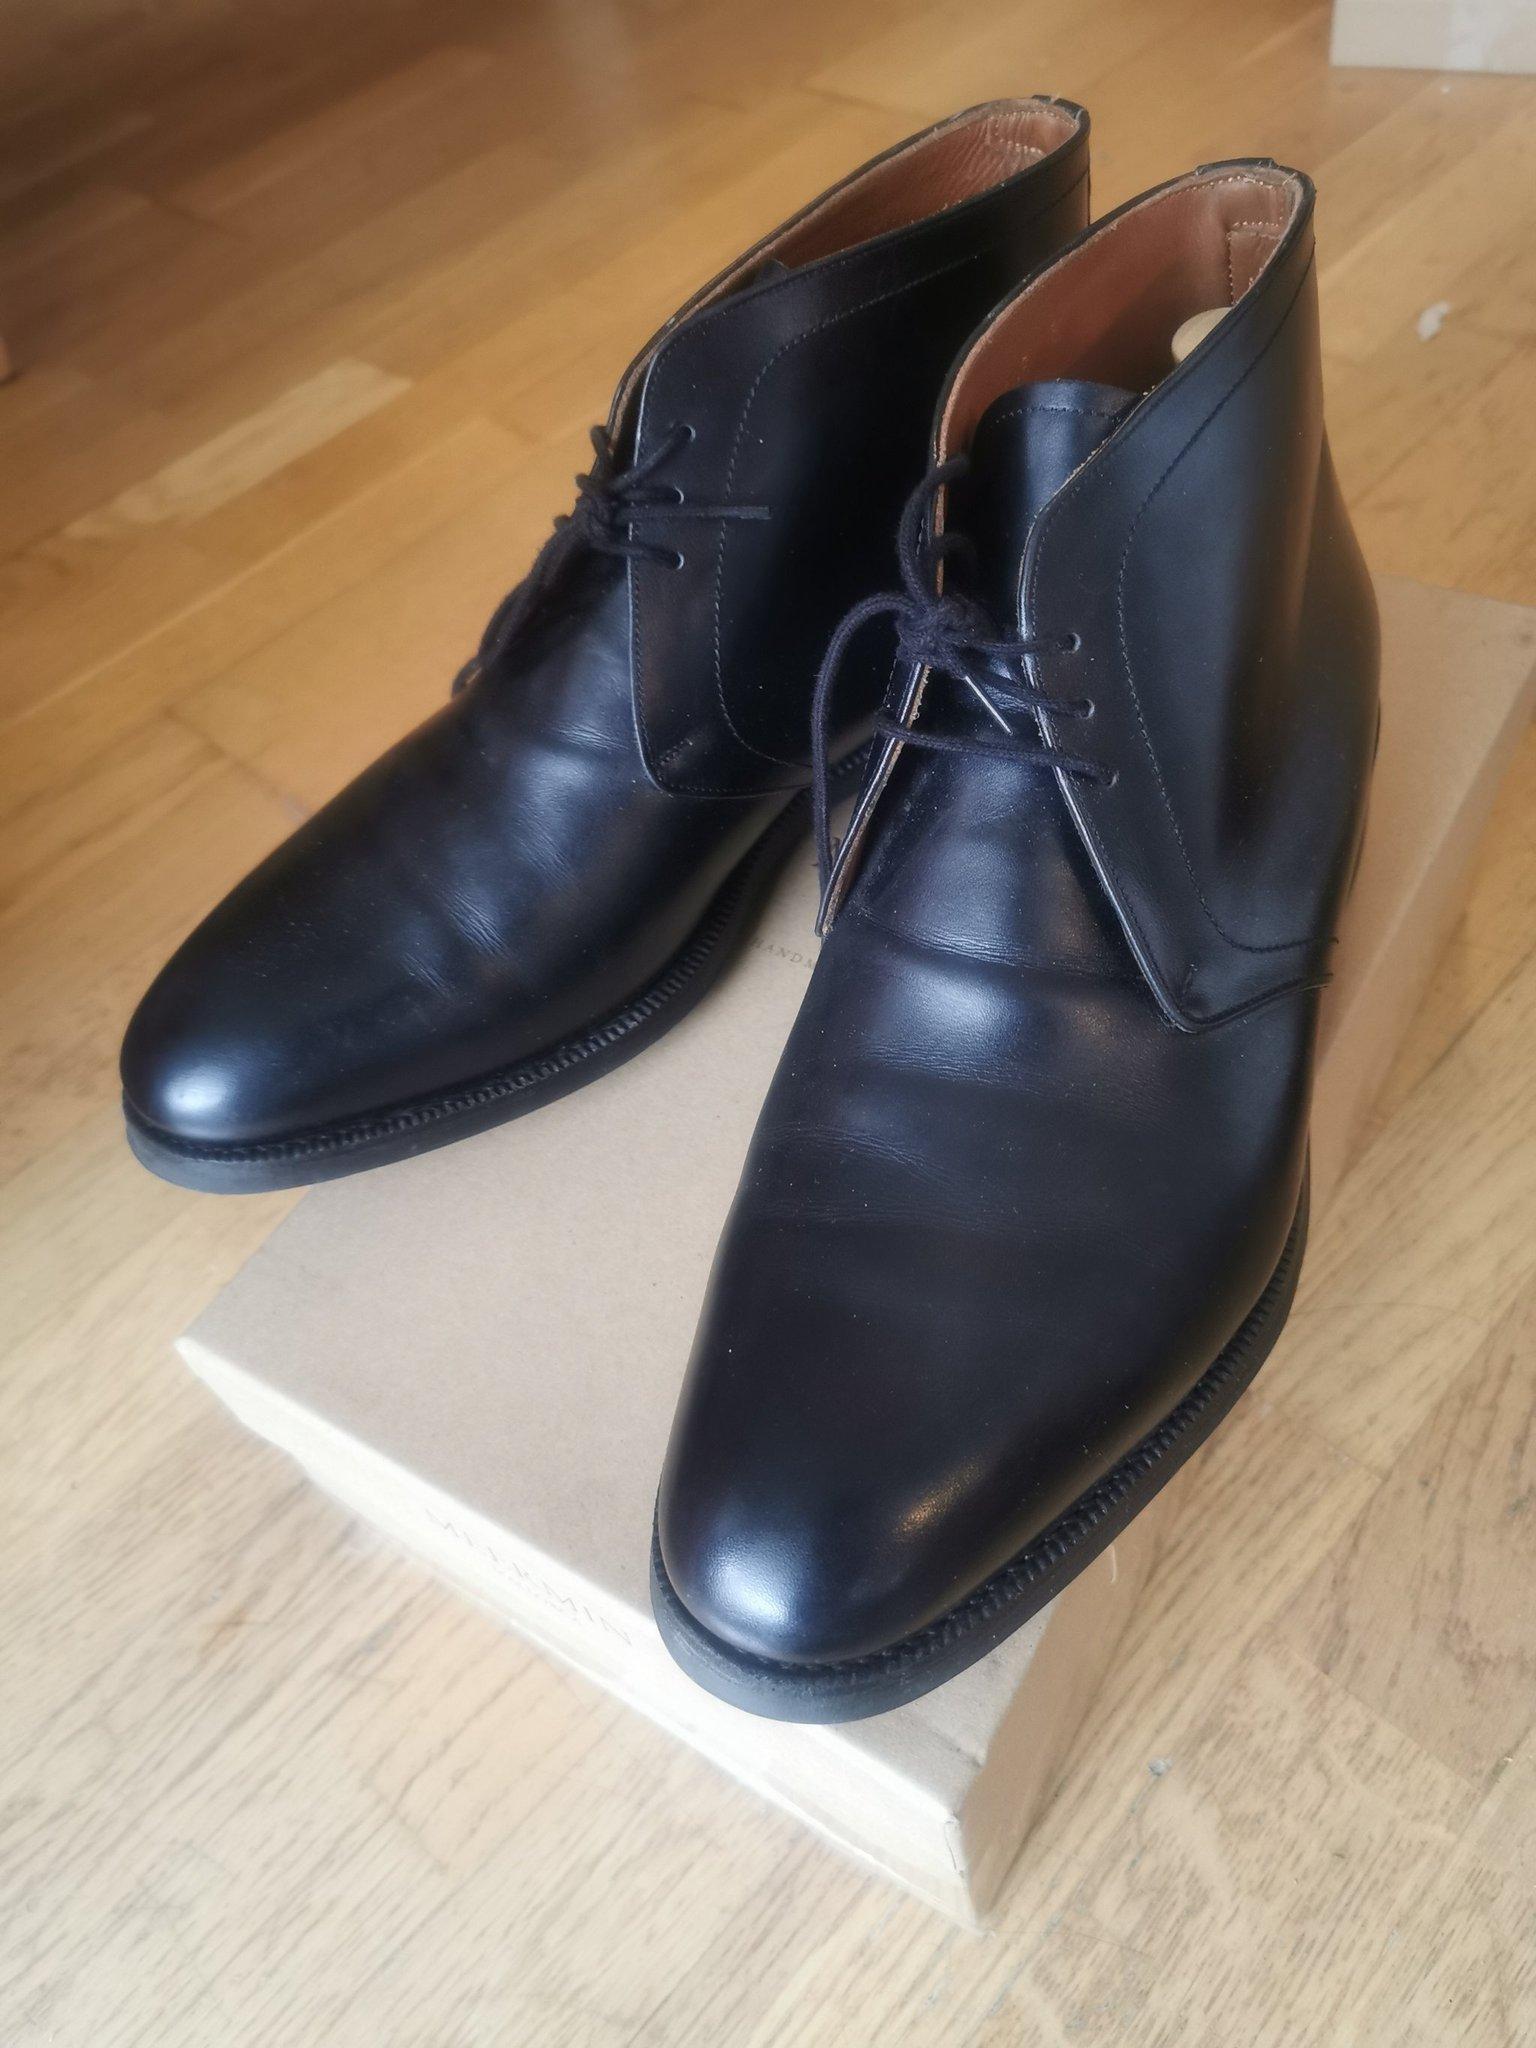 Meermin m box chukka boots skor UK8, 42. Randsydda, Loake,Barker